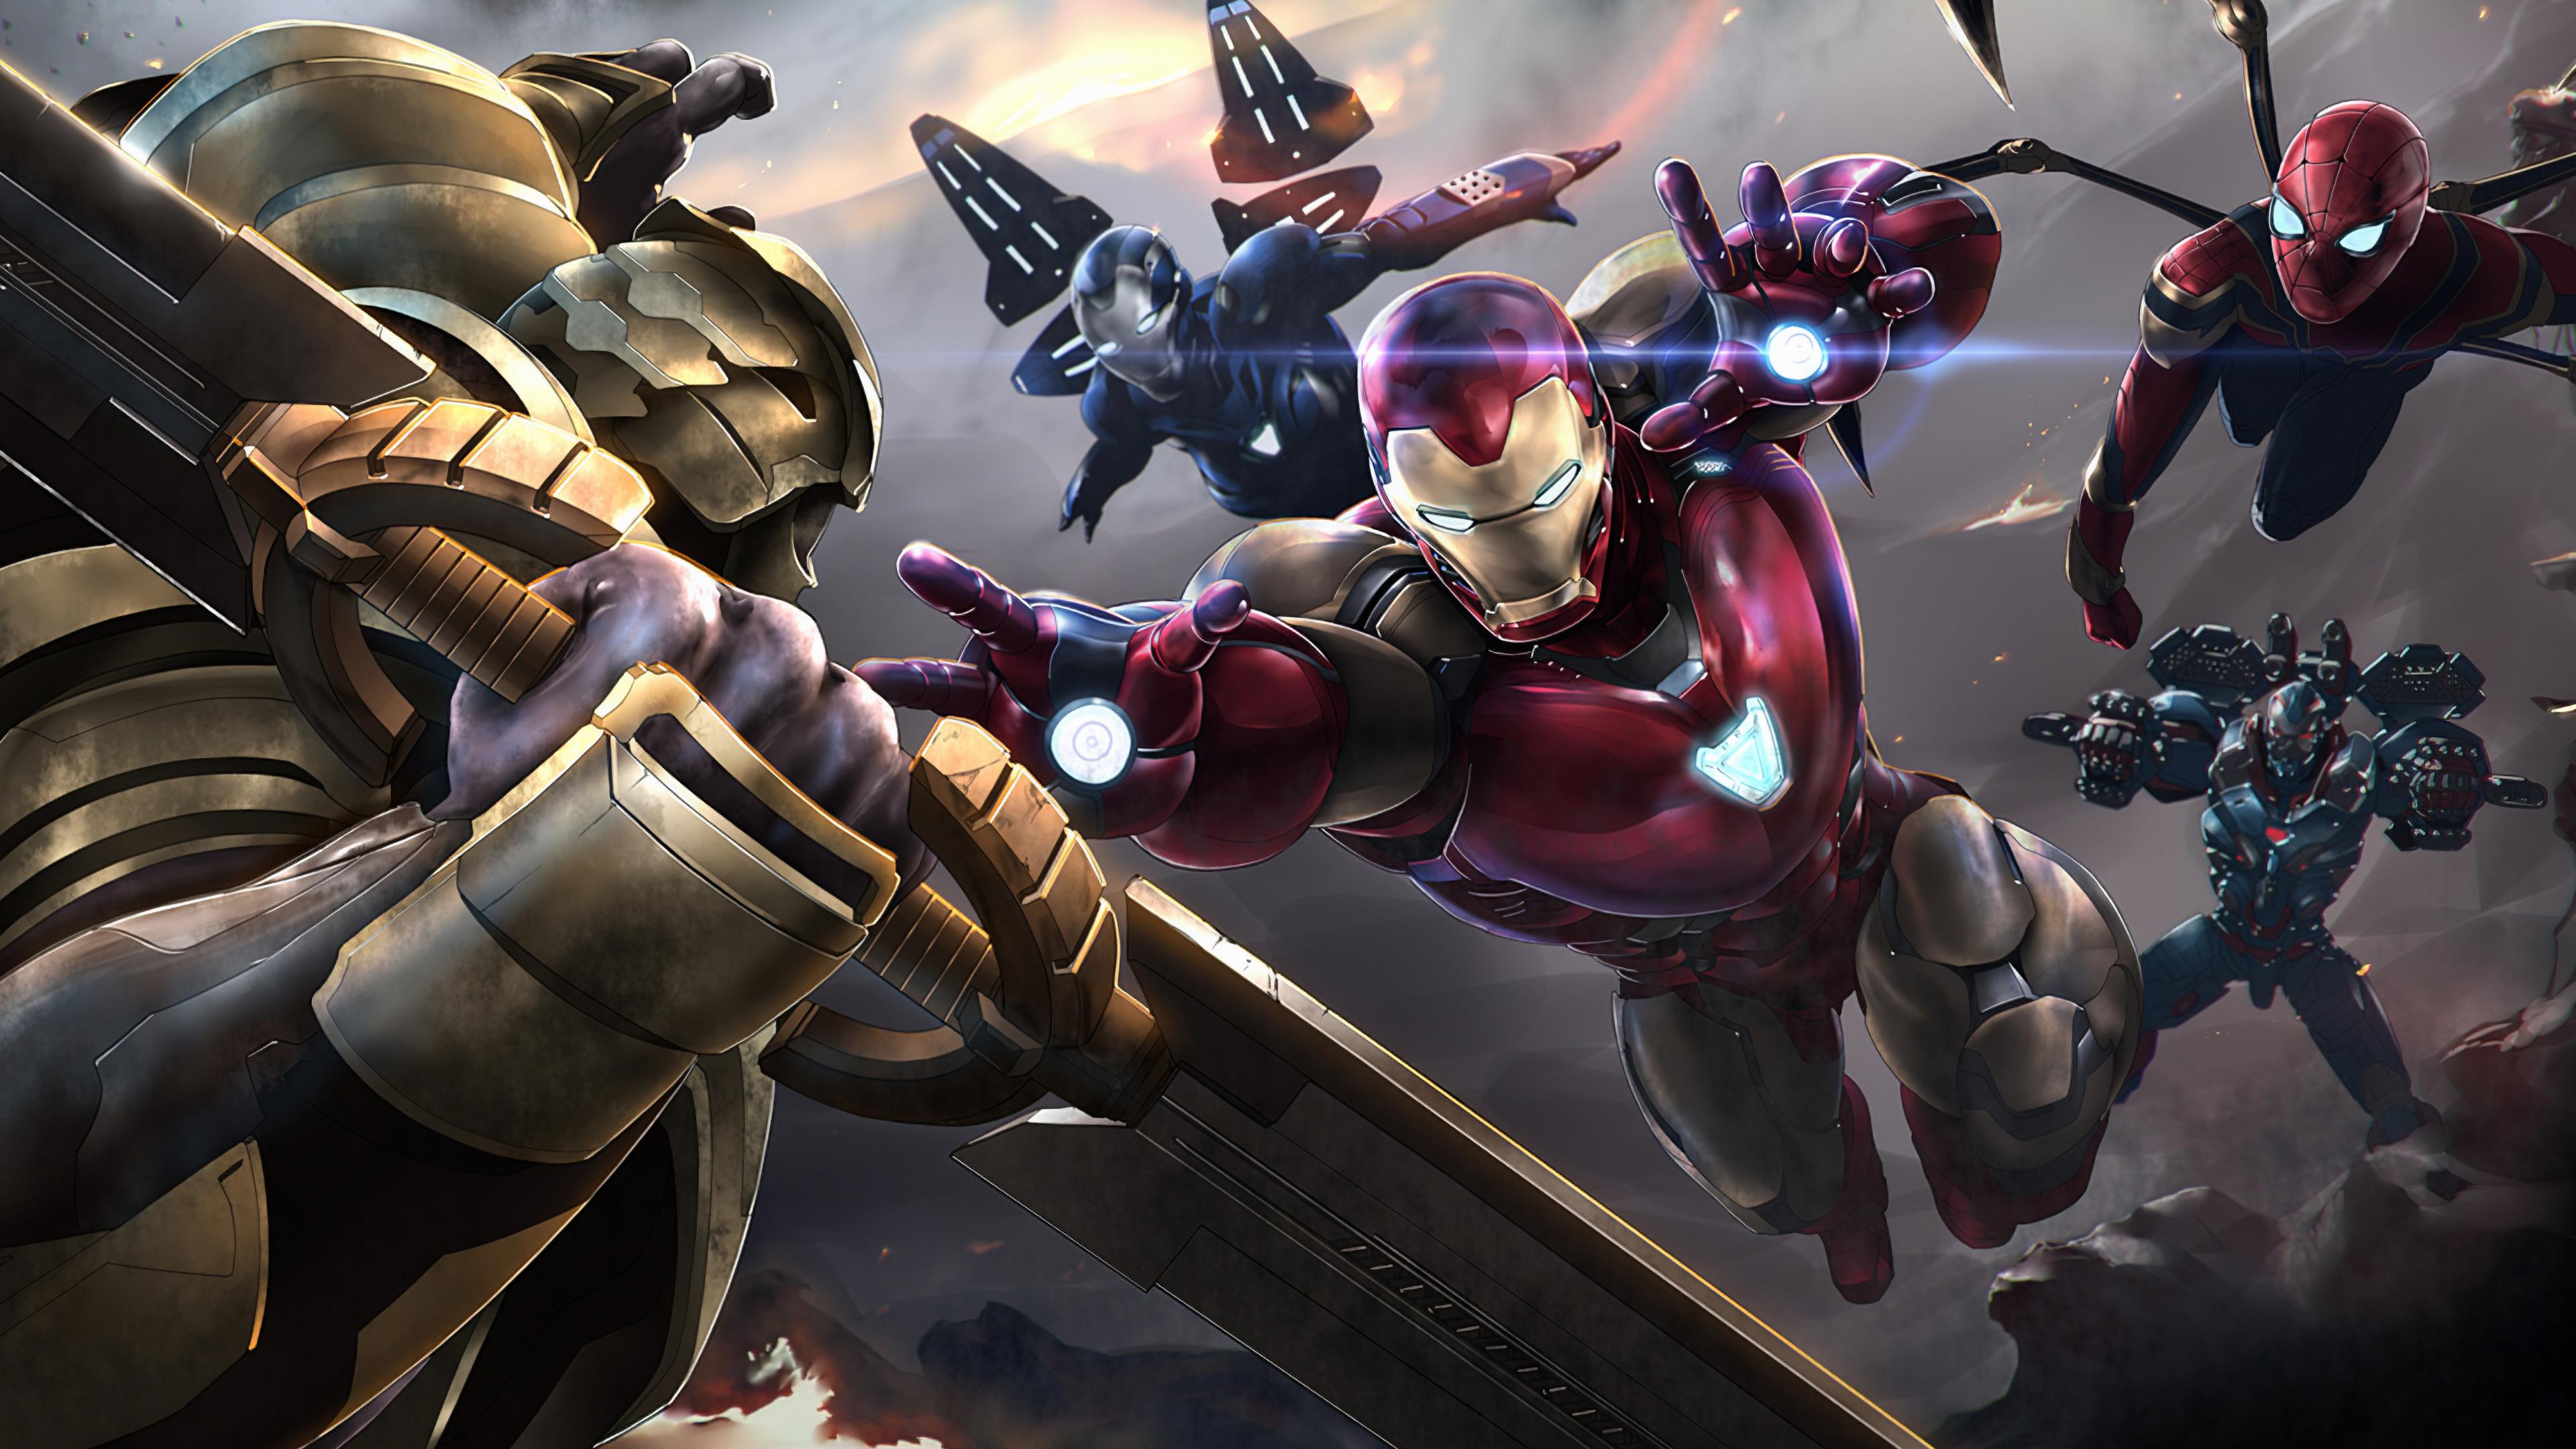 thanos-vs-iron-man-team-ec.jpg